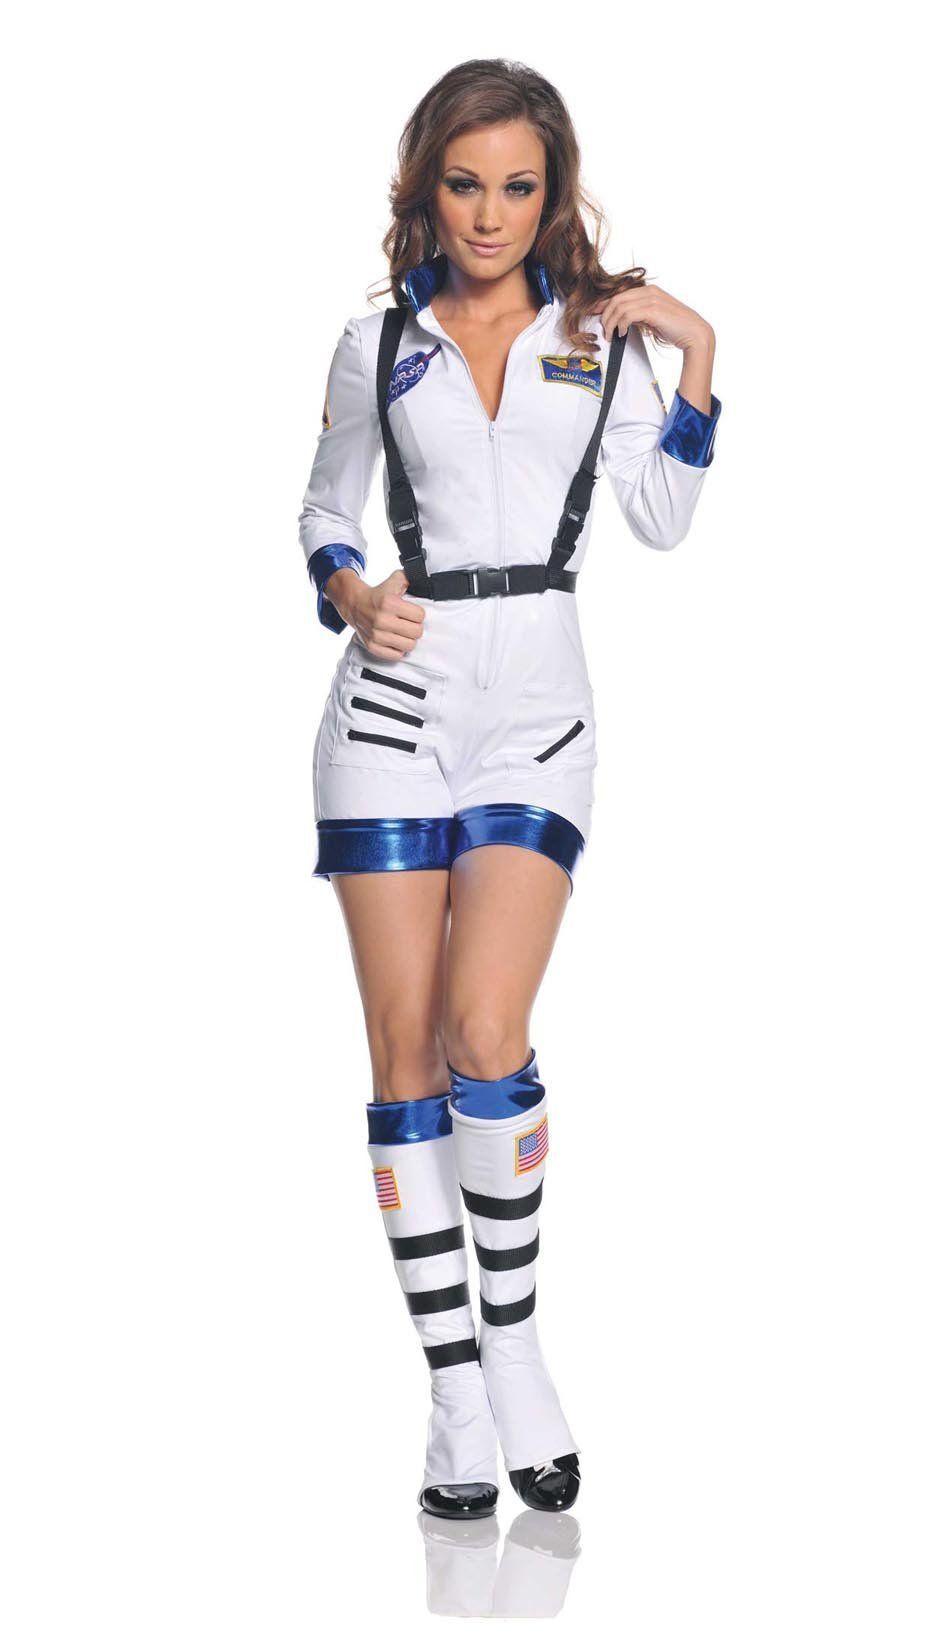 Rocket Female Astronaut Stretch Romper Costume White Adult  sc 1 st  Pinterest & Rocket Female Astronaut Stretch Romper Costume White Adult ...